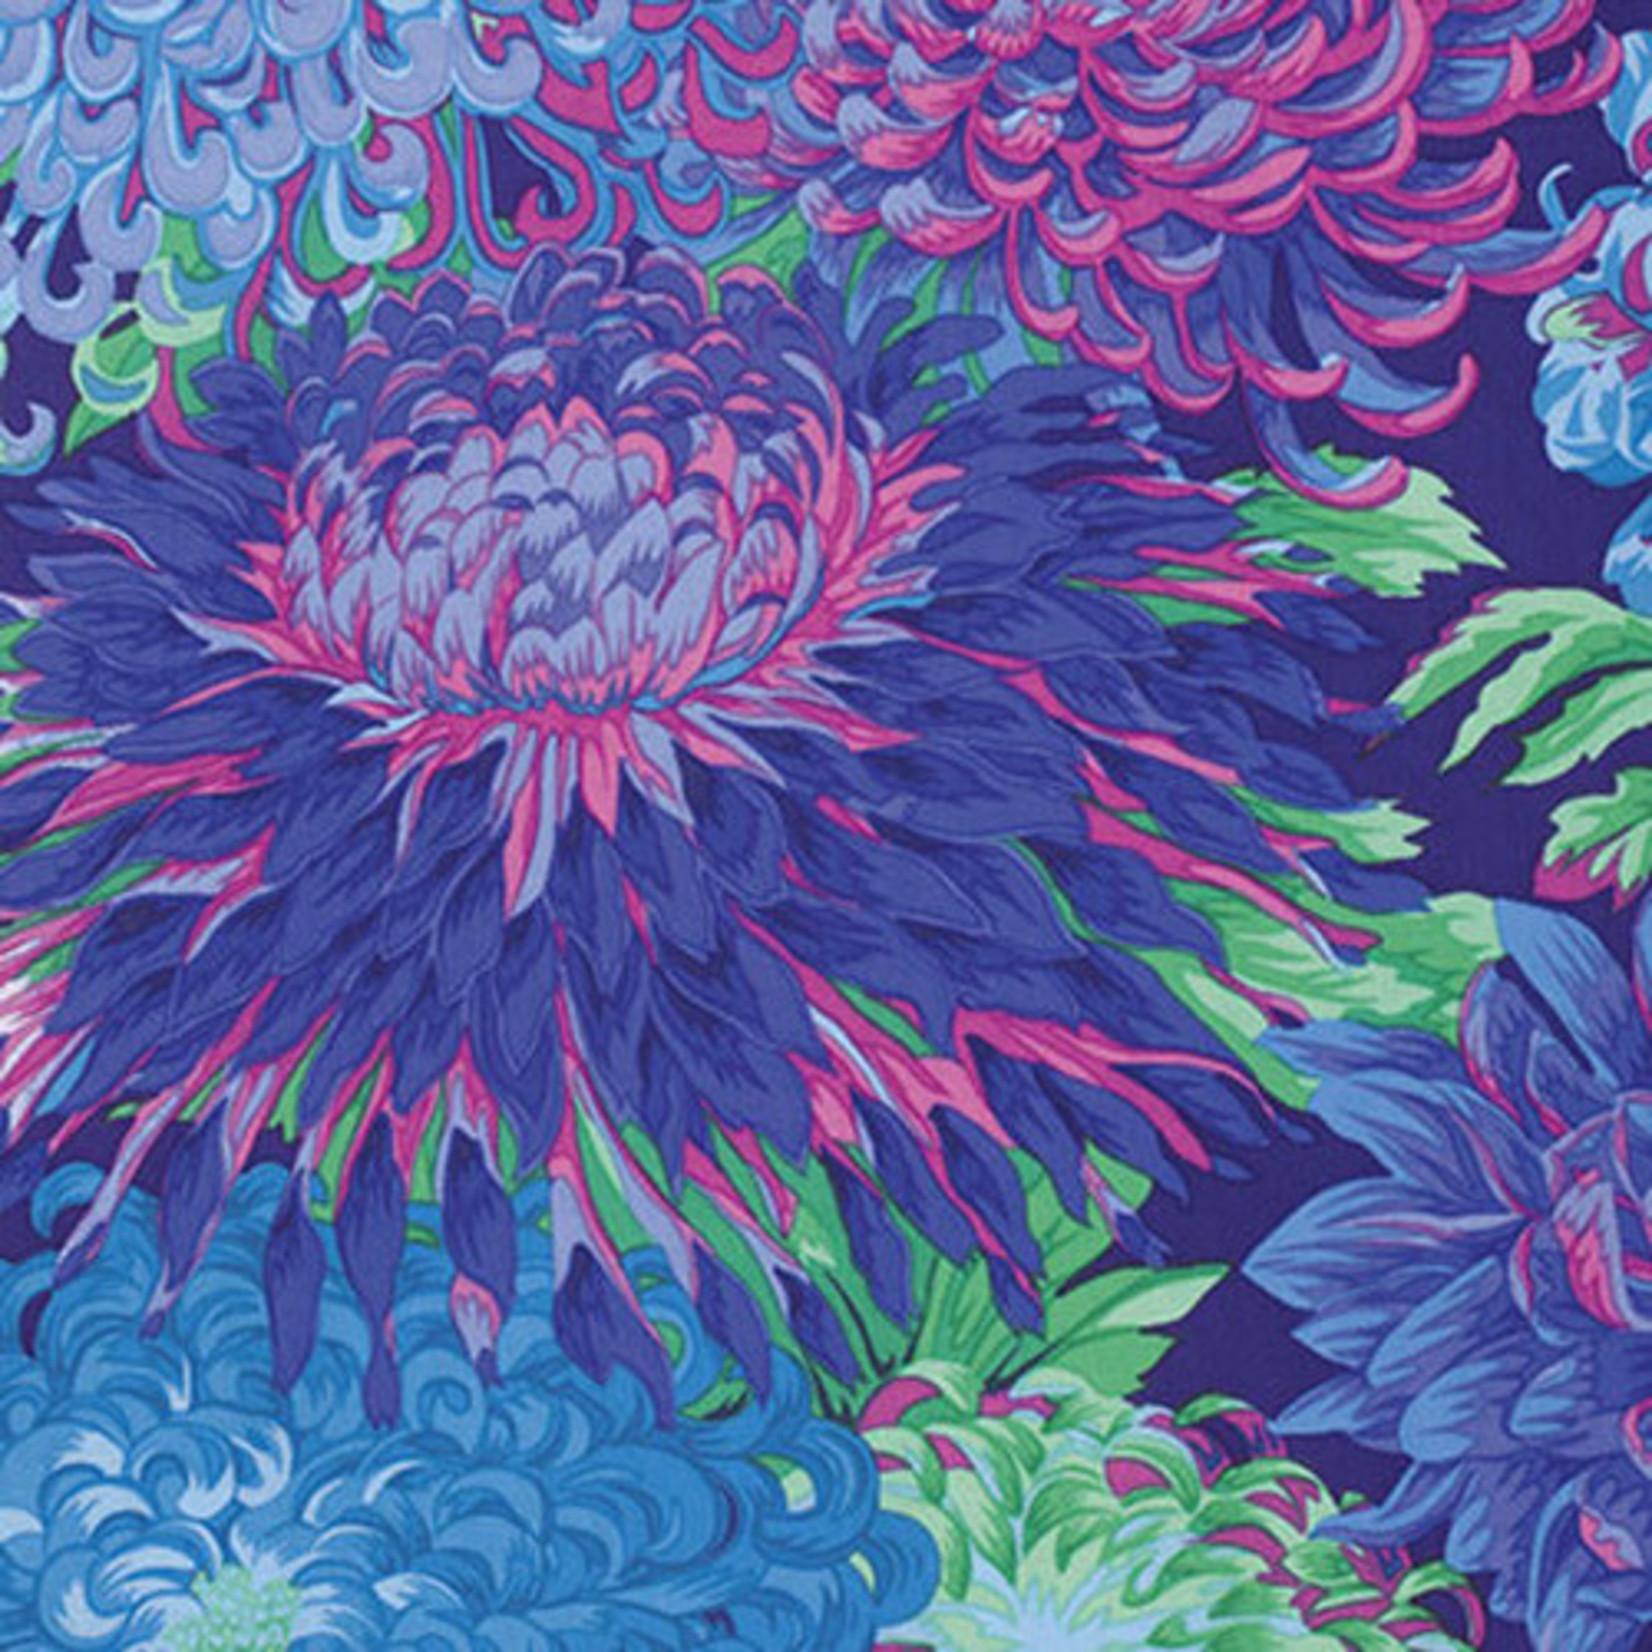 Kaffe Fassett KF Collective - Japanese Chrysanthemum, Blue (PWPJ041.BLUEX) $0.18 per cm or $18/m